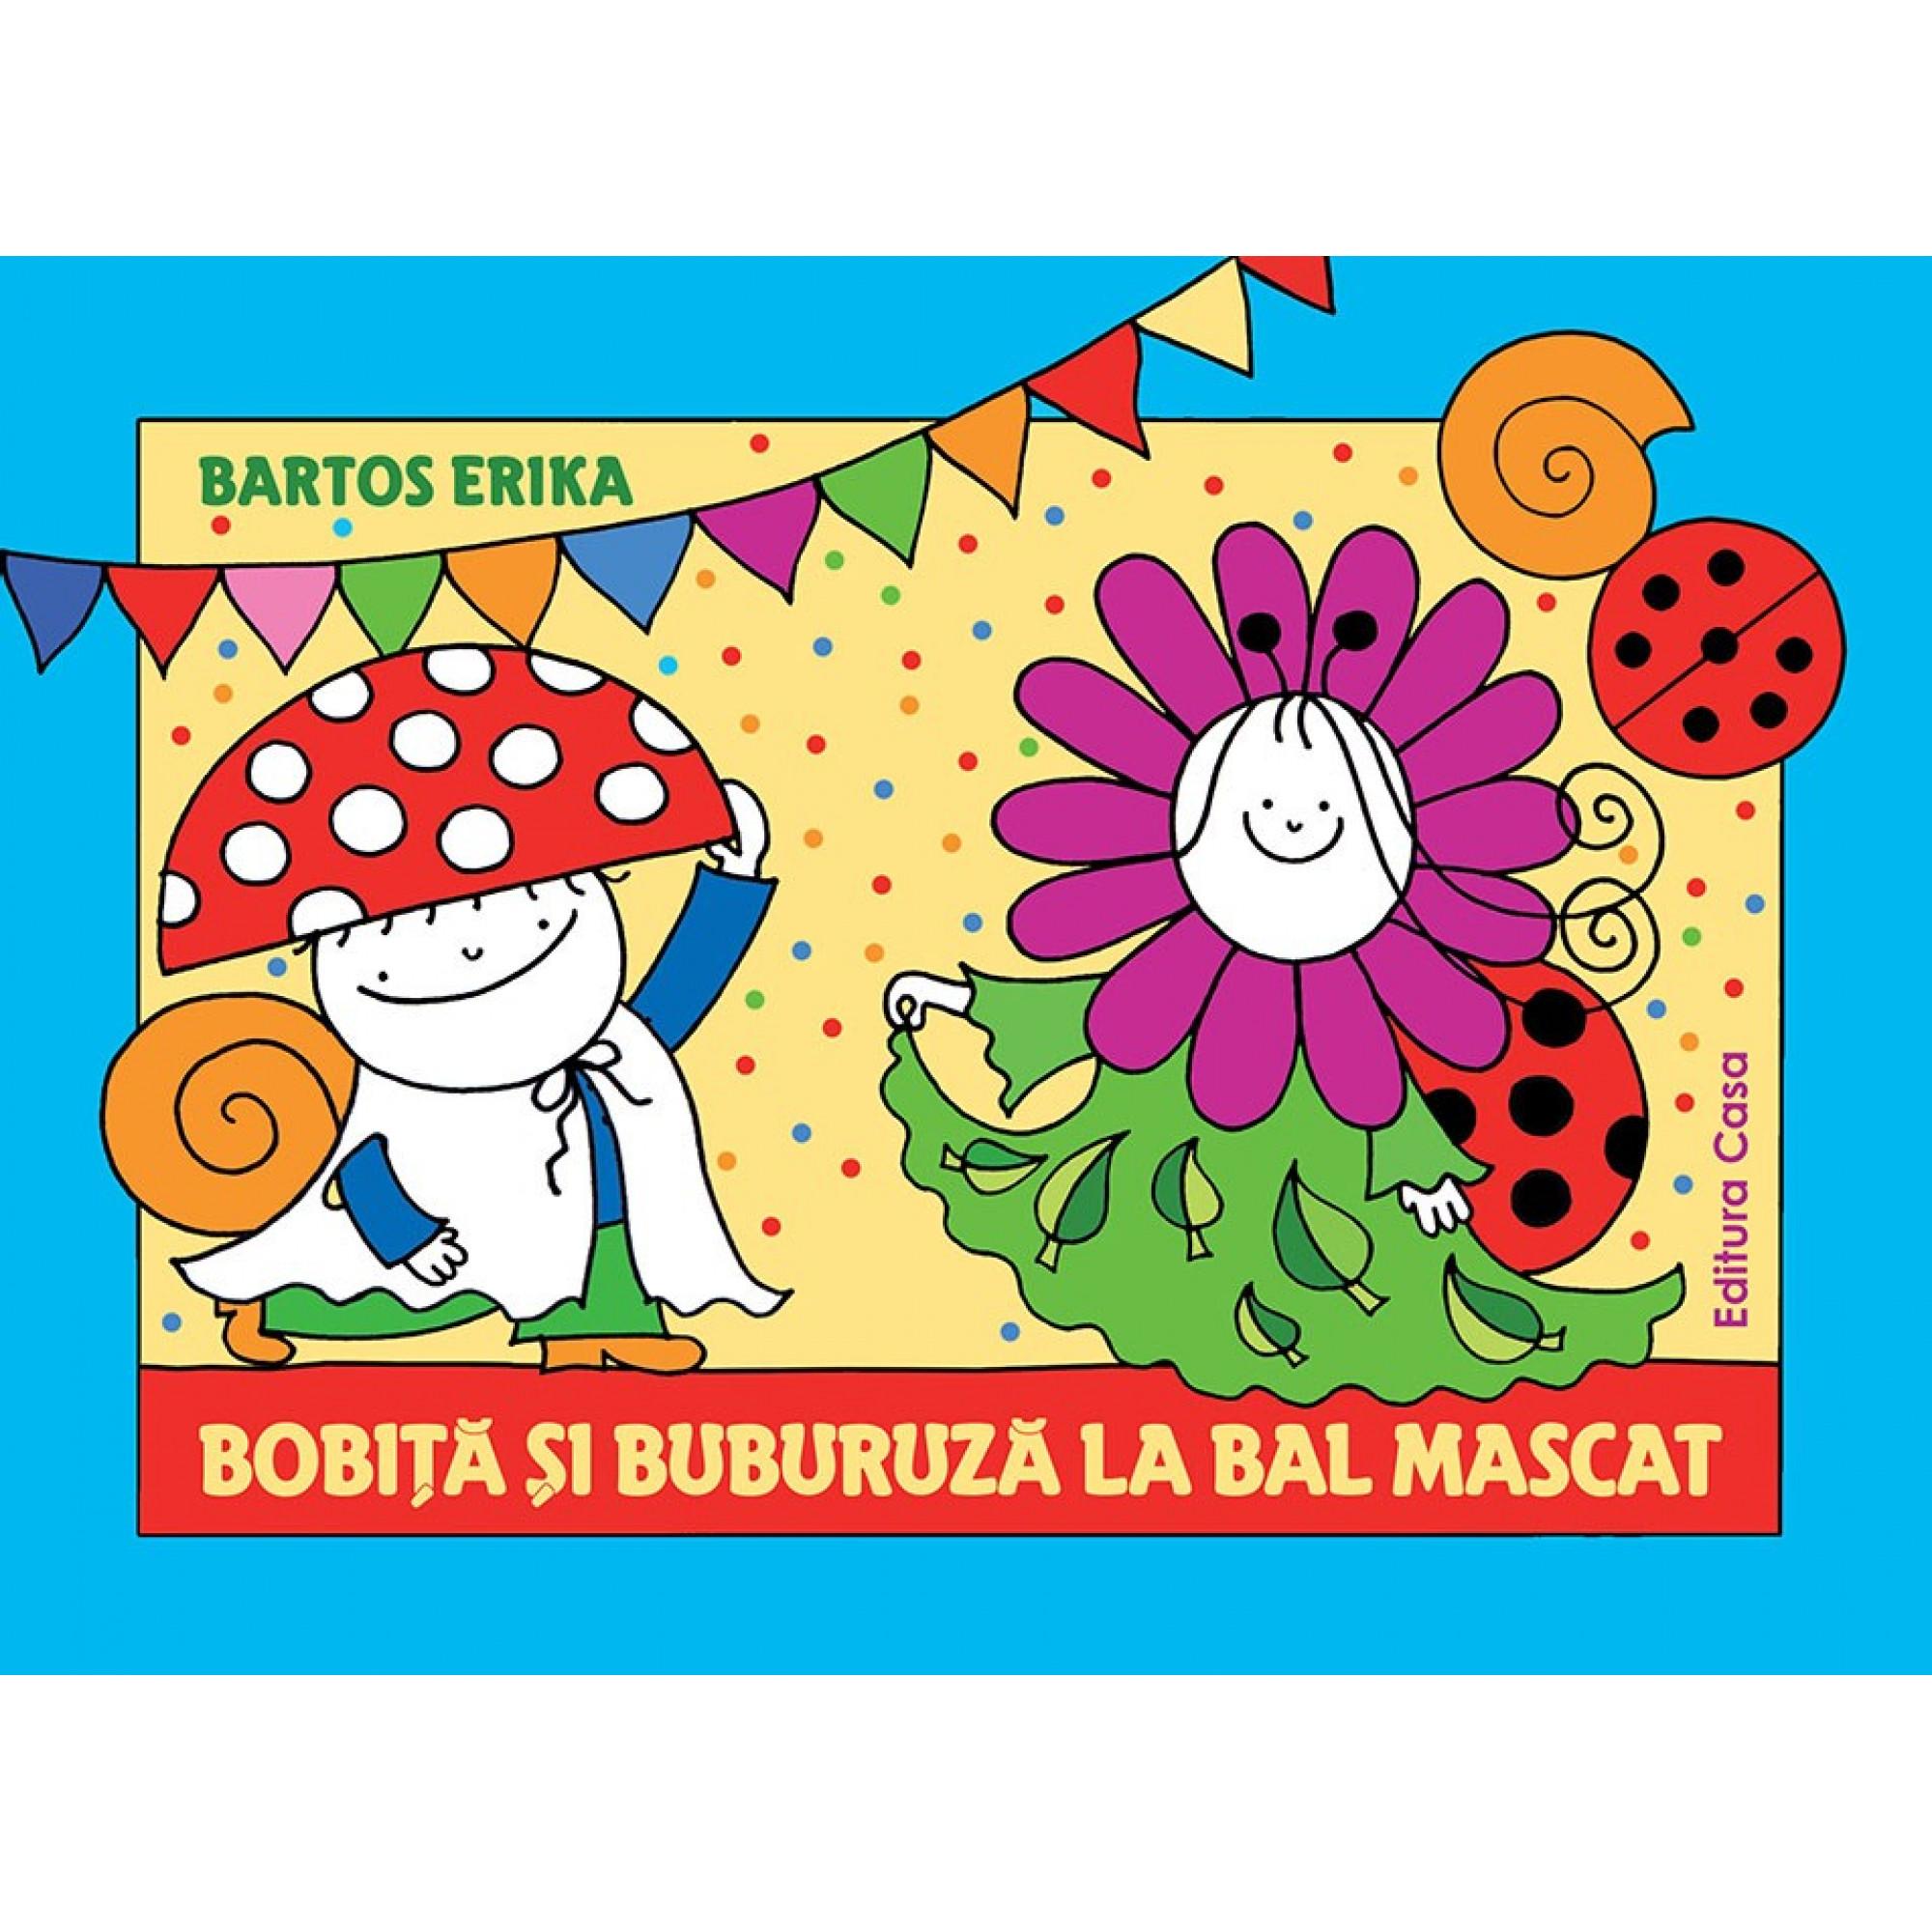 Bobiță și Buburuză la bal mascat; Erika Bartos